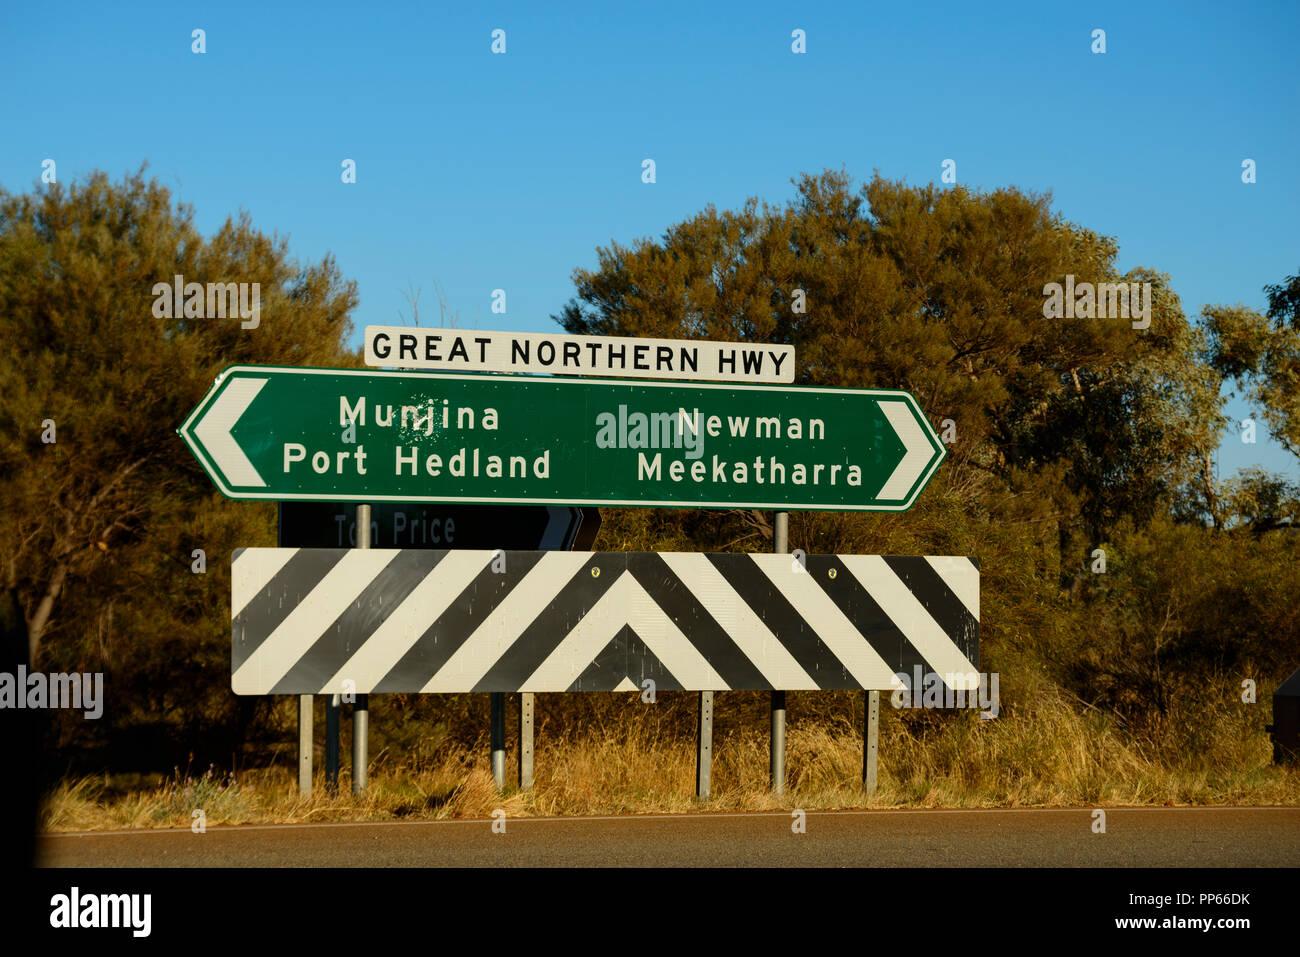 Road Sign, Great Nothern Highway, Port Headland, Newman, Munjina, Meekatharra. Australia Stock Photo